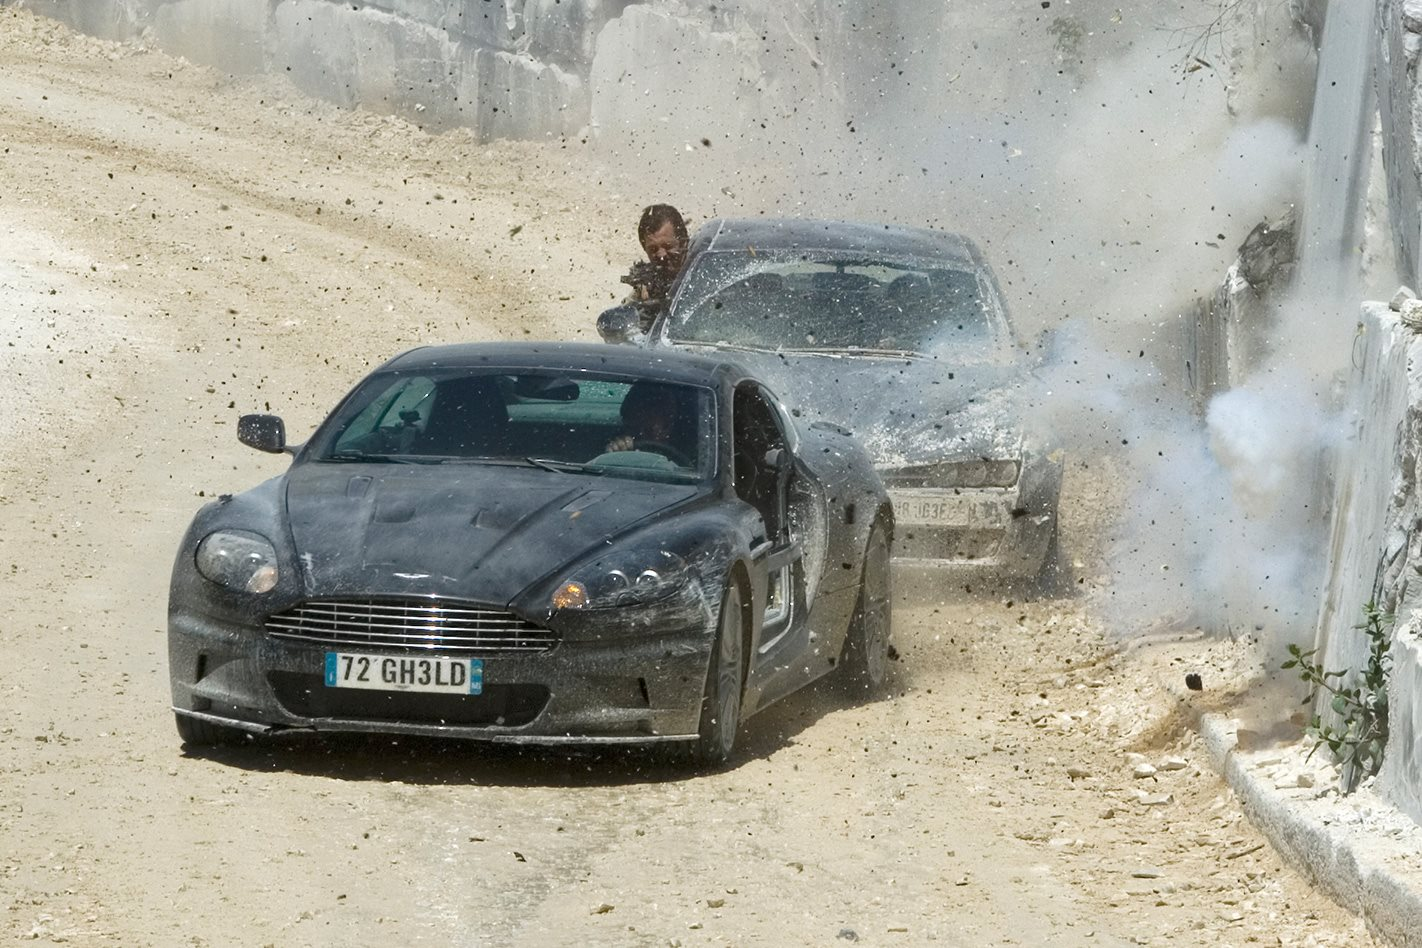 Aston Martin DBS - Casino Royale (2006) Quantum of Solace (2008)